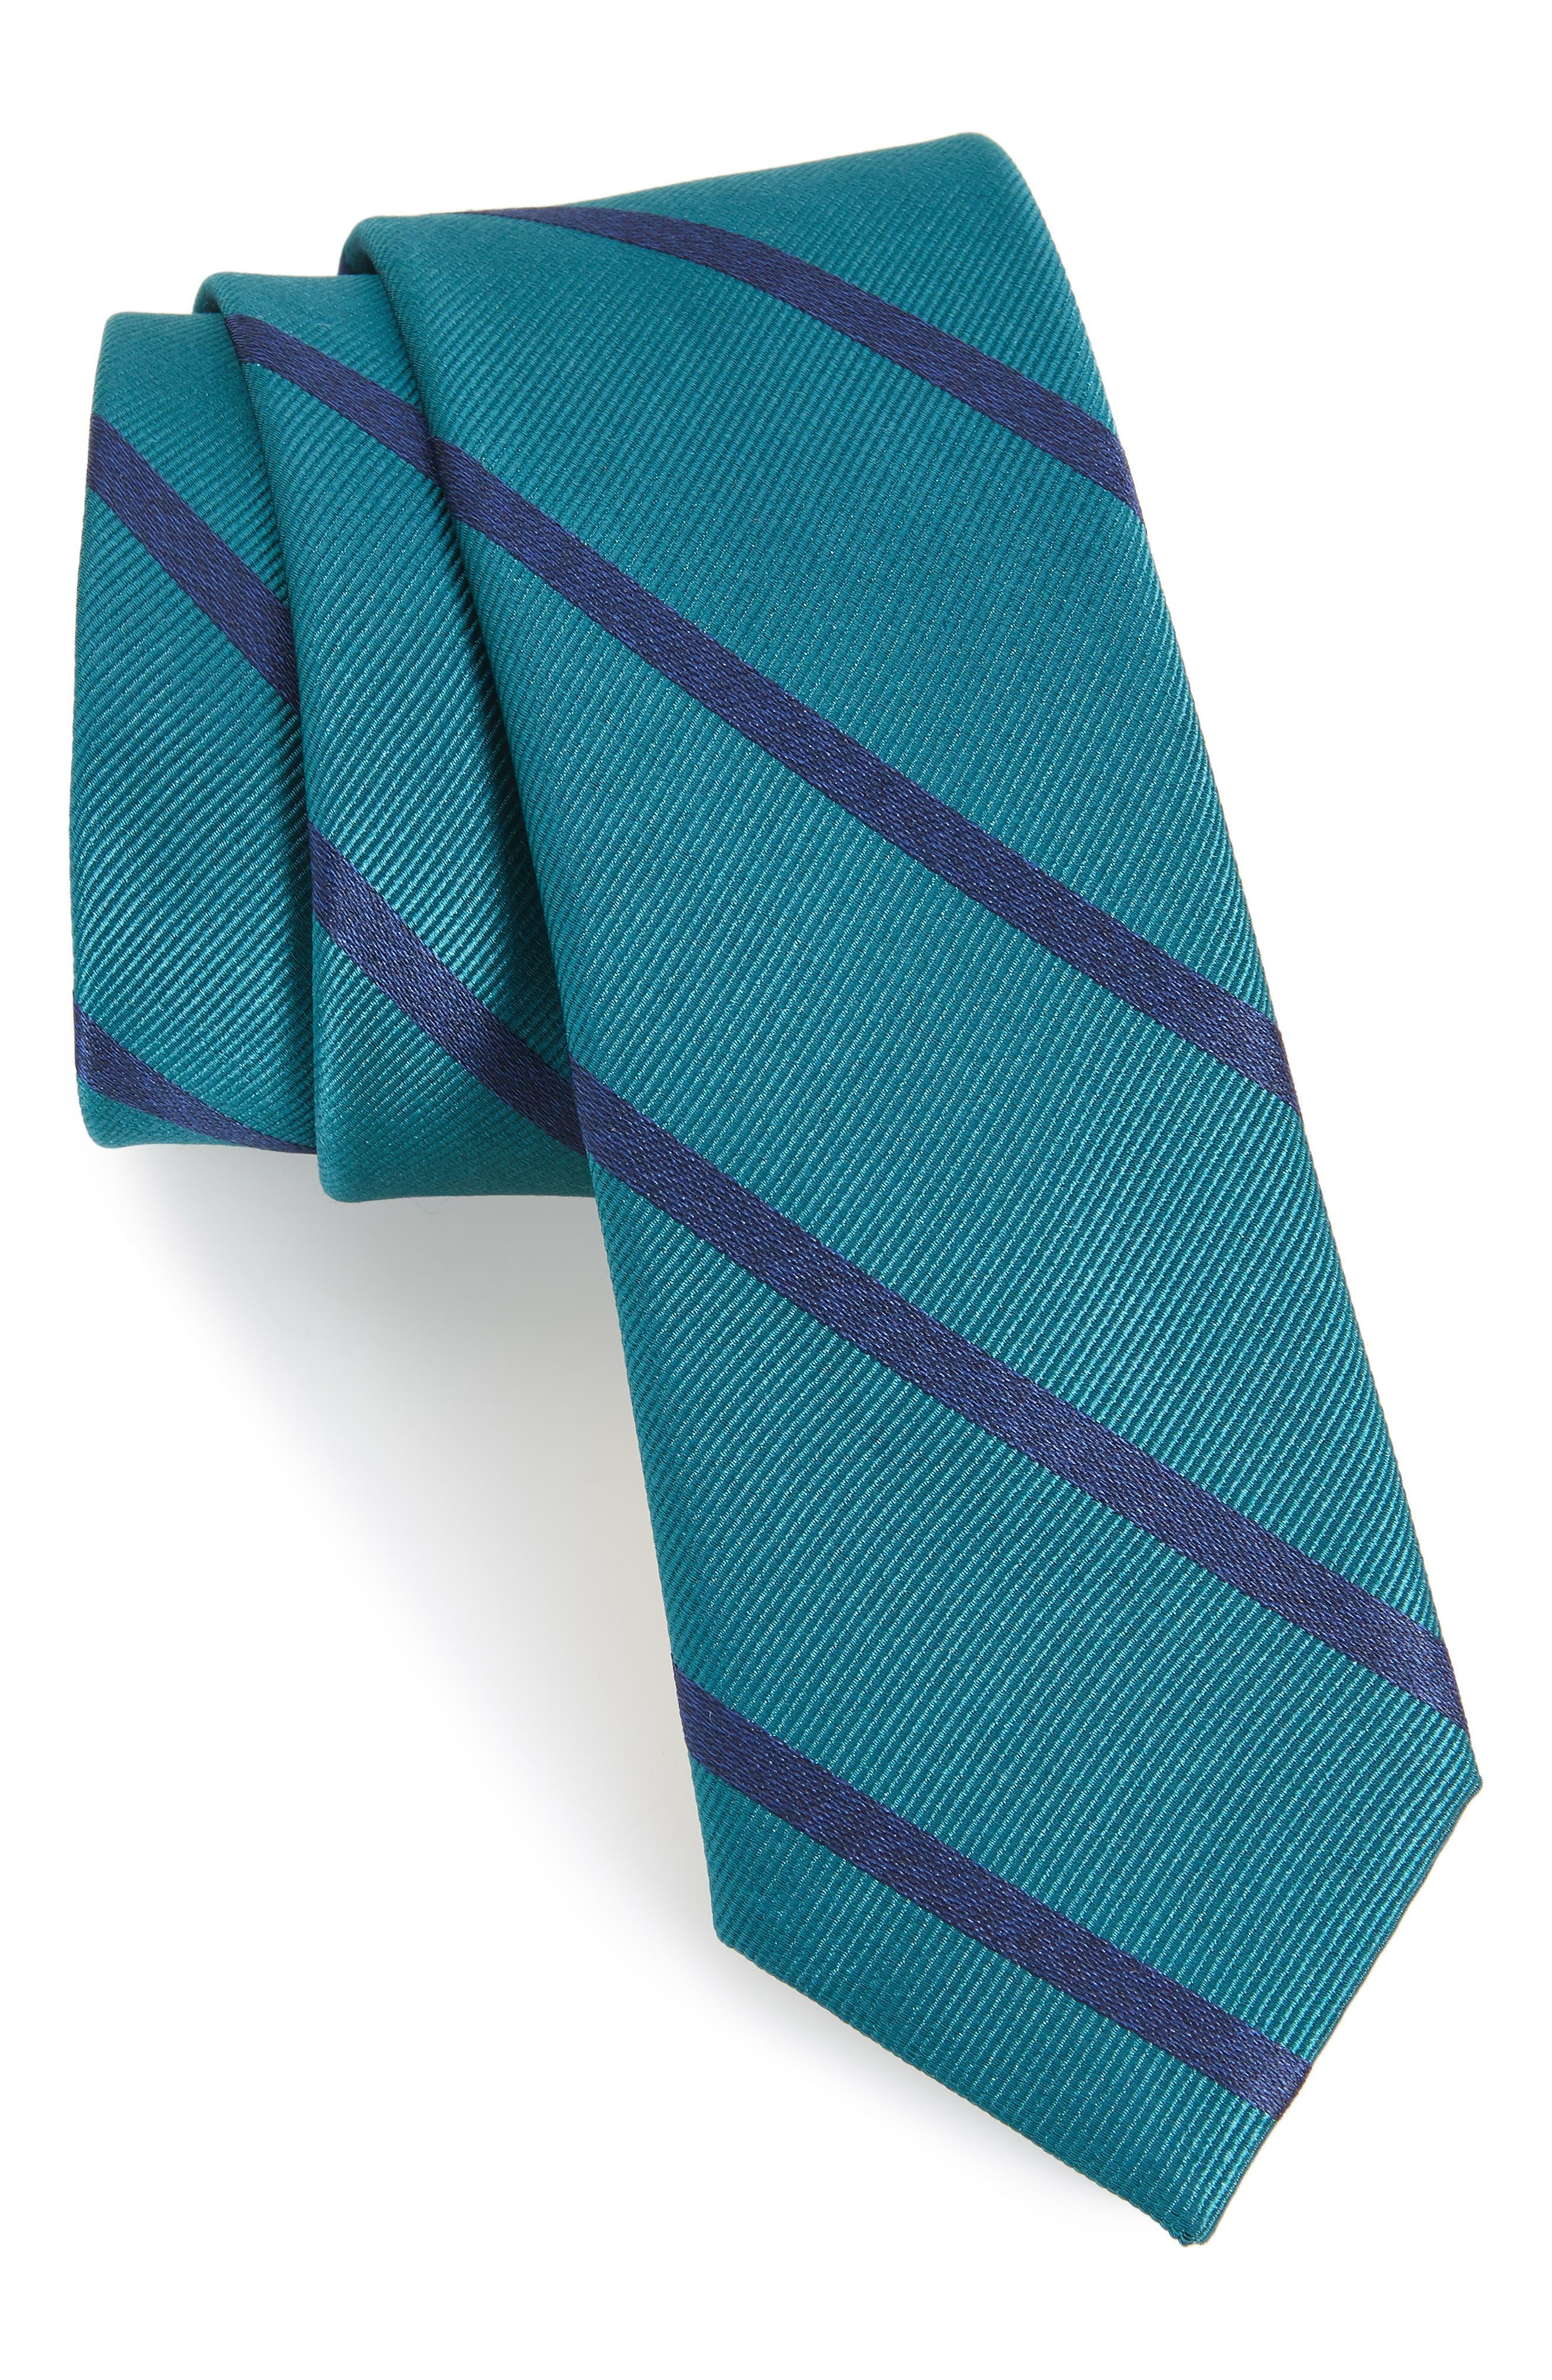 Wheelhouse Stripe Silk Skinny Tie,                             Main thumbnail 1, color,                             TEAL